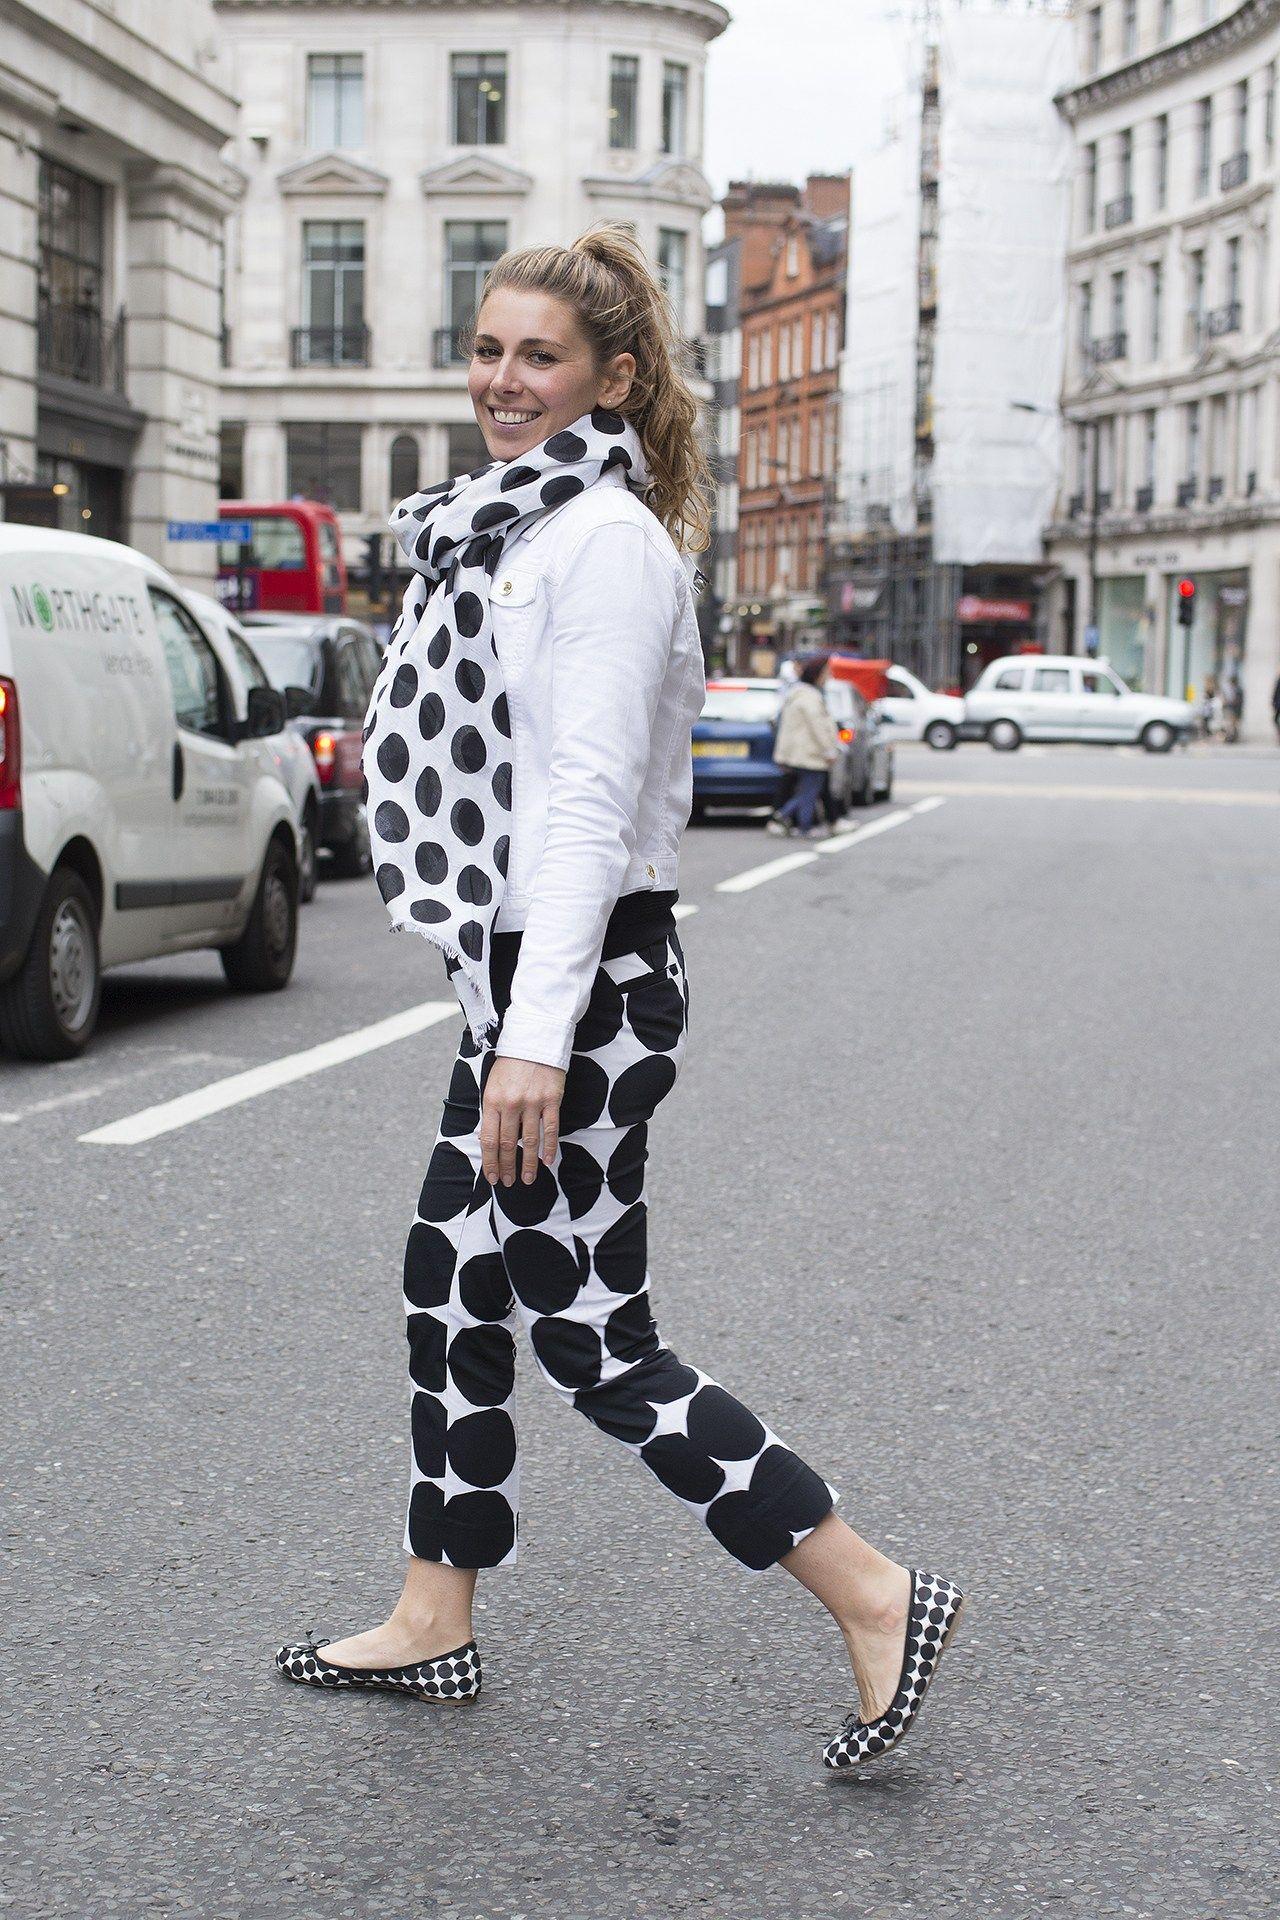 Marimekko for Banana Republic scarf, trousers and shoes as well as a Banana Republic jacket.